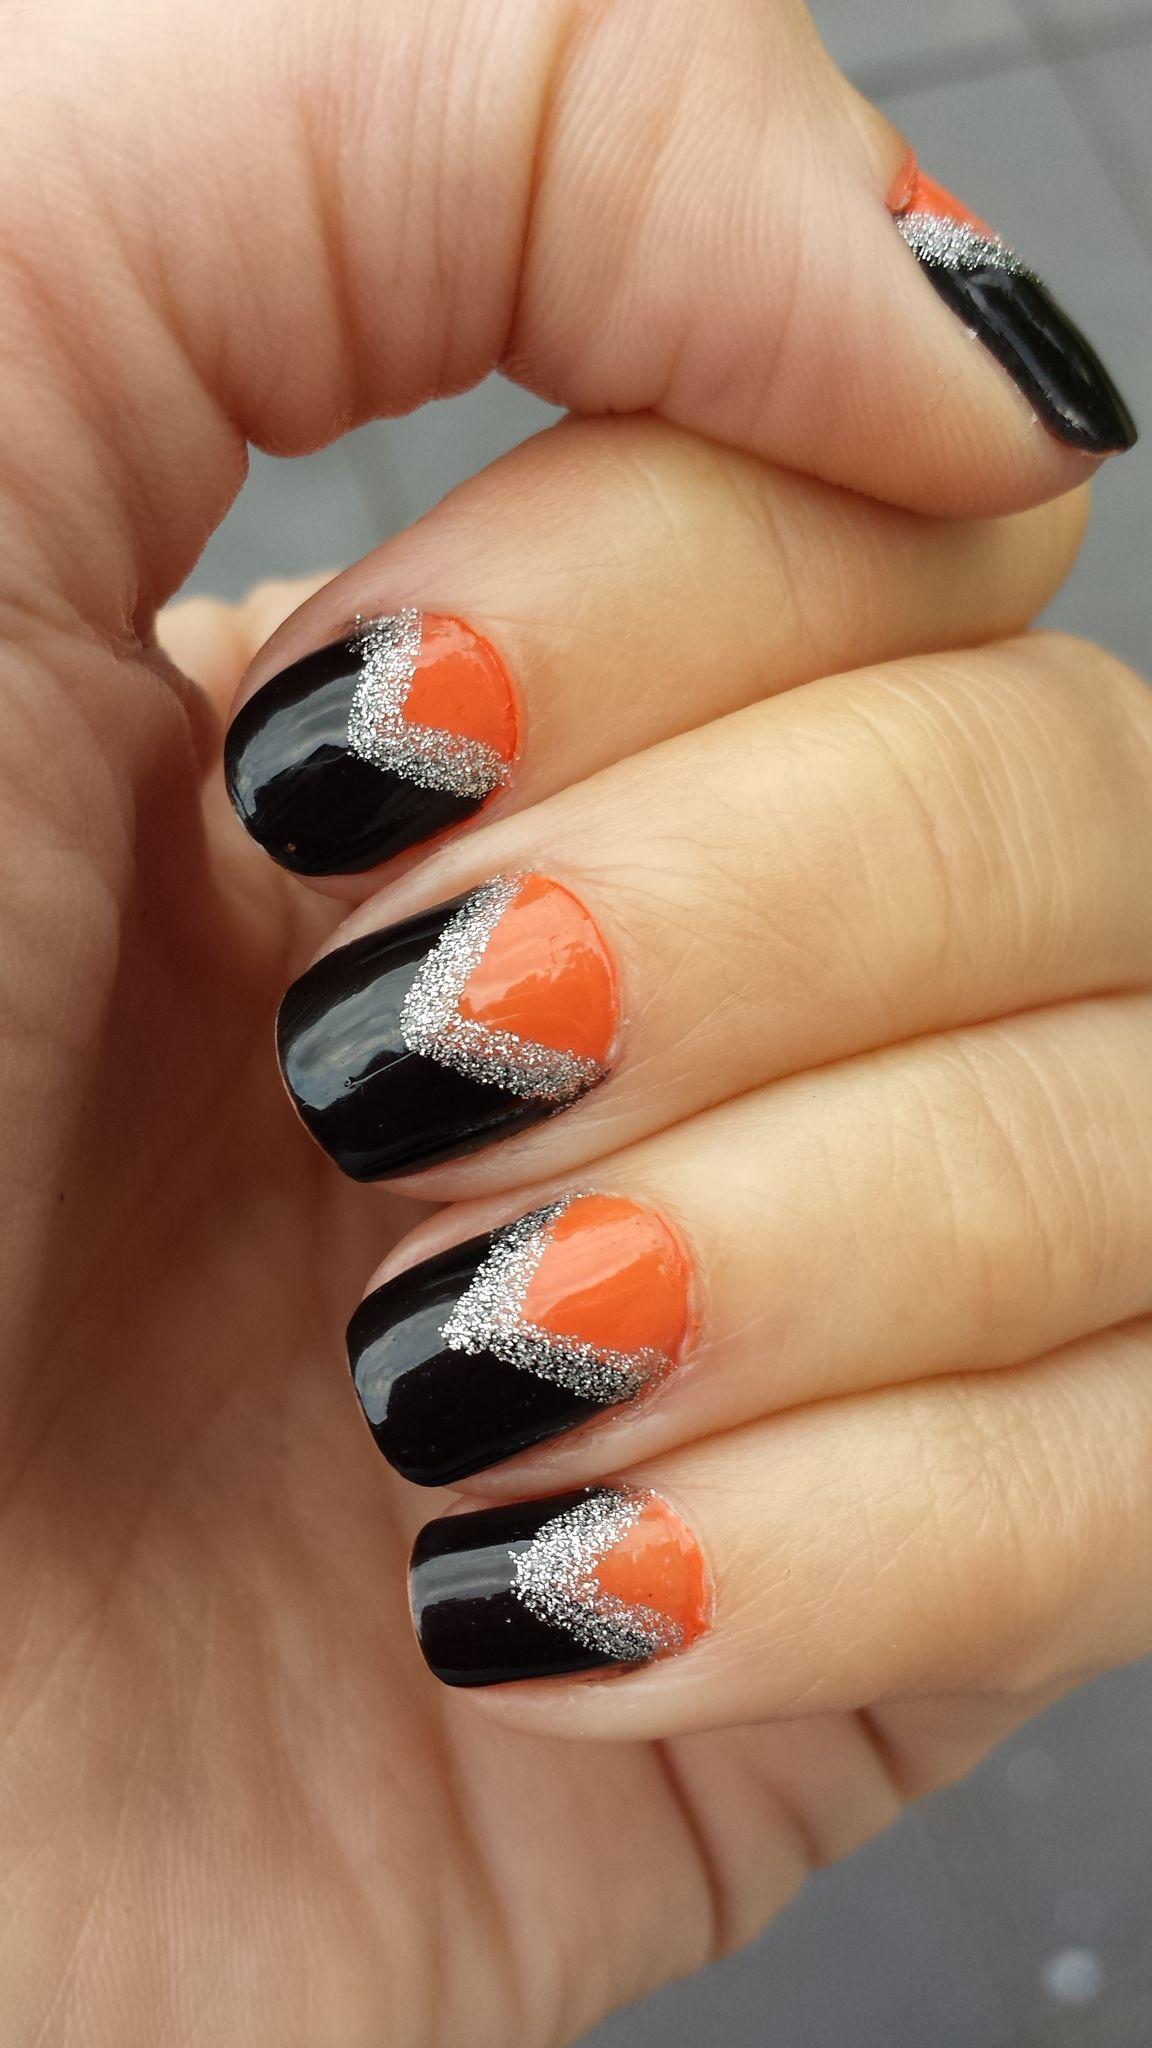 polish nail couture - black